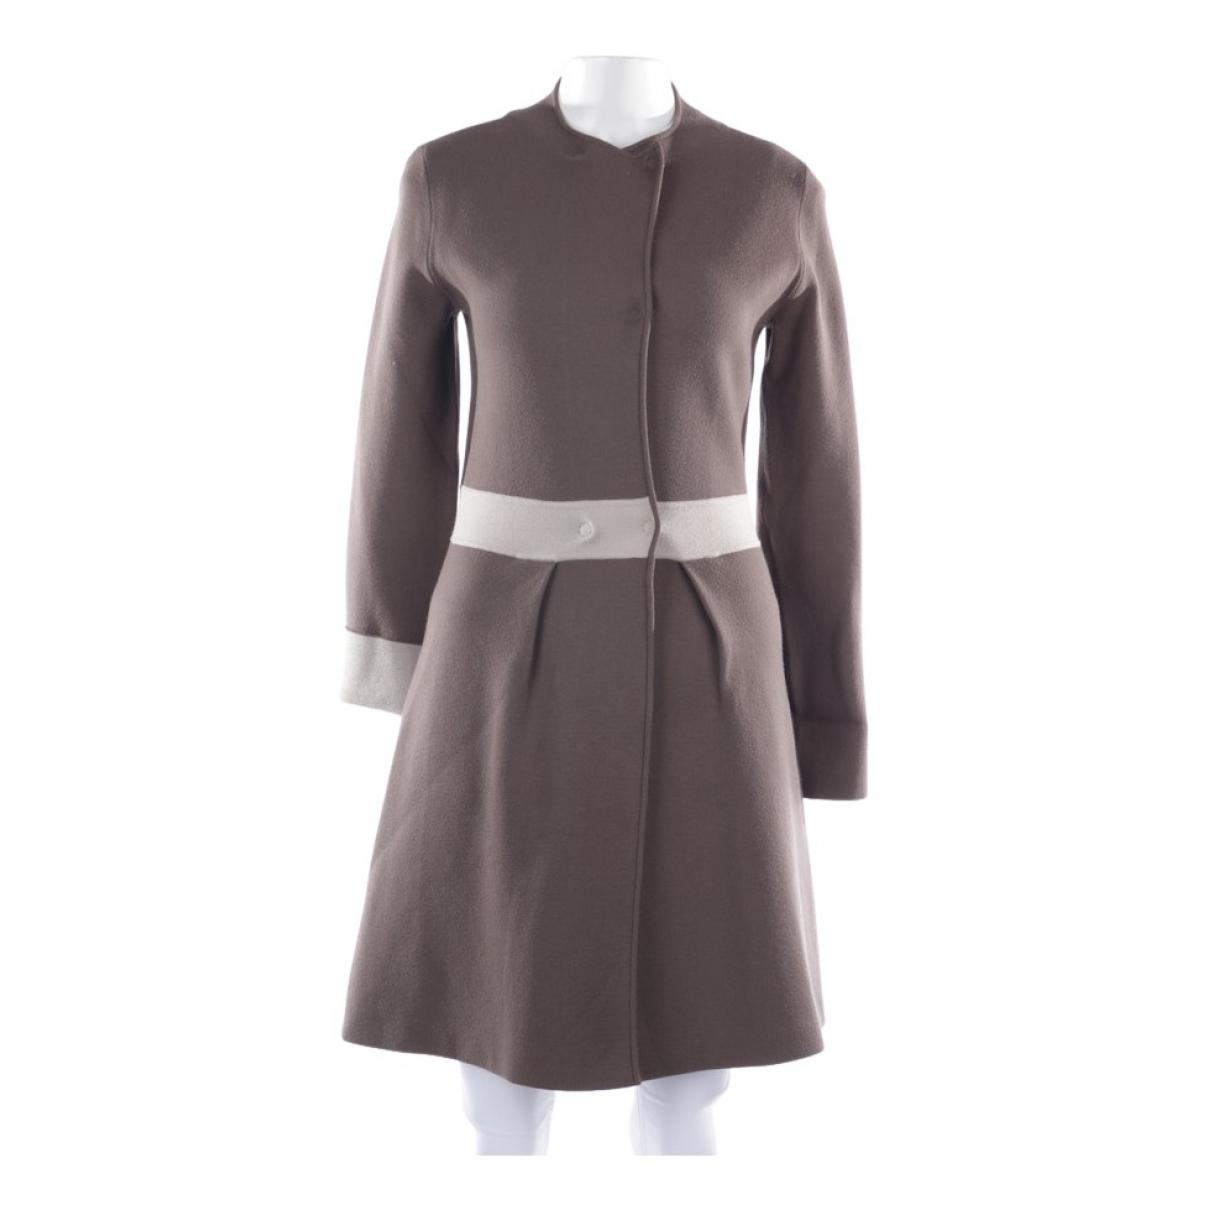 Armani Collezioni \N Brown jacket for Women 36 FR